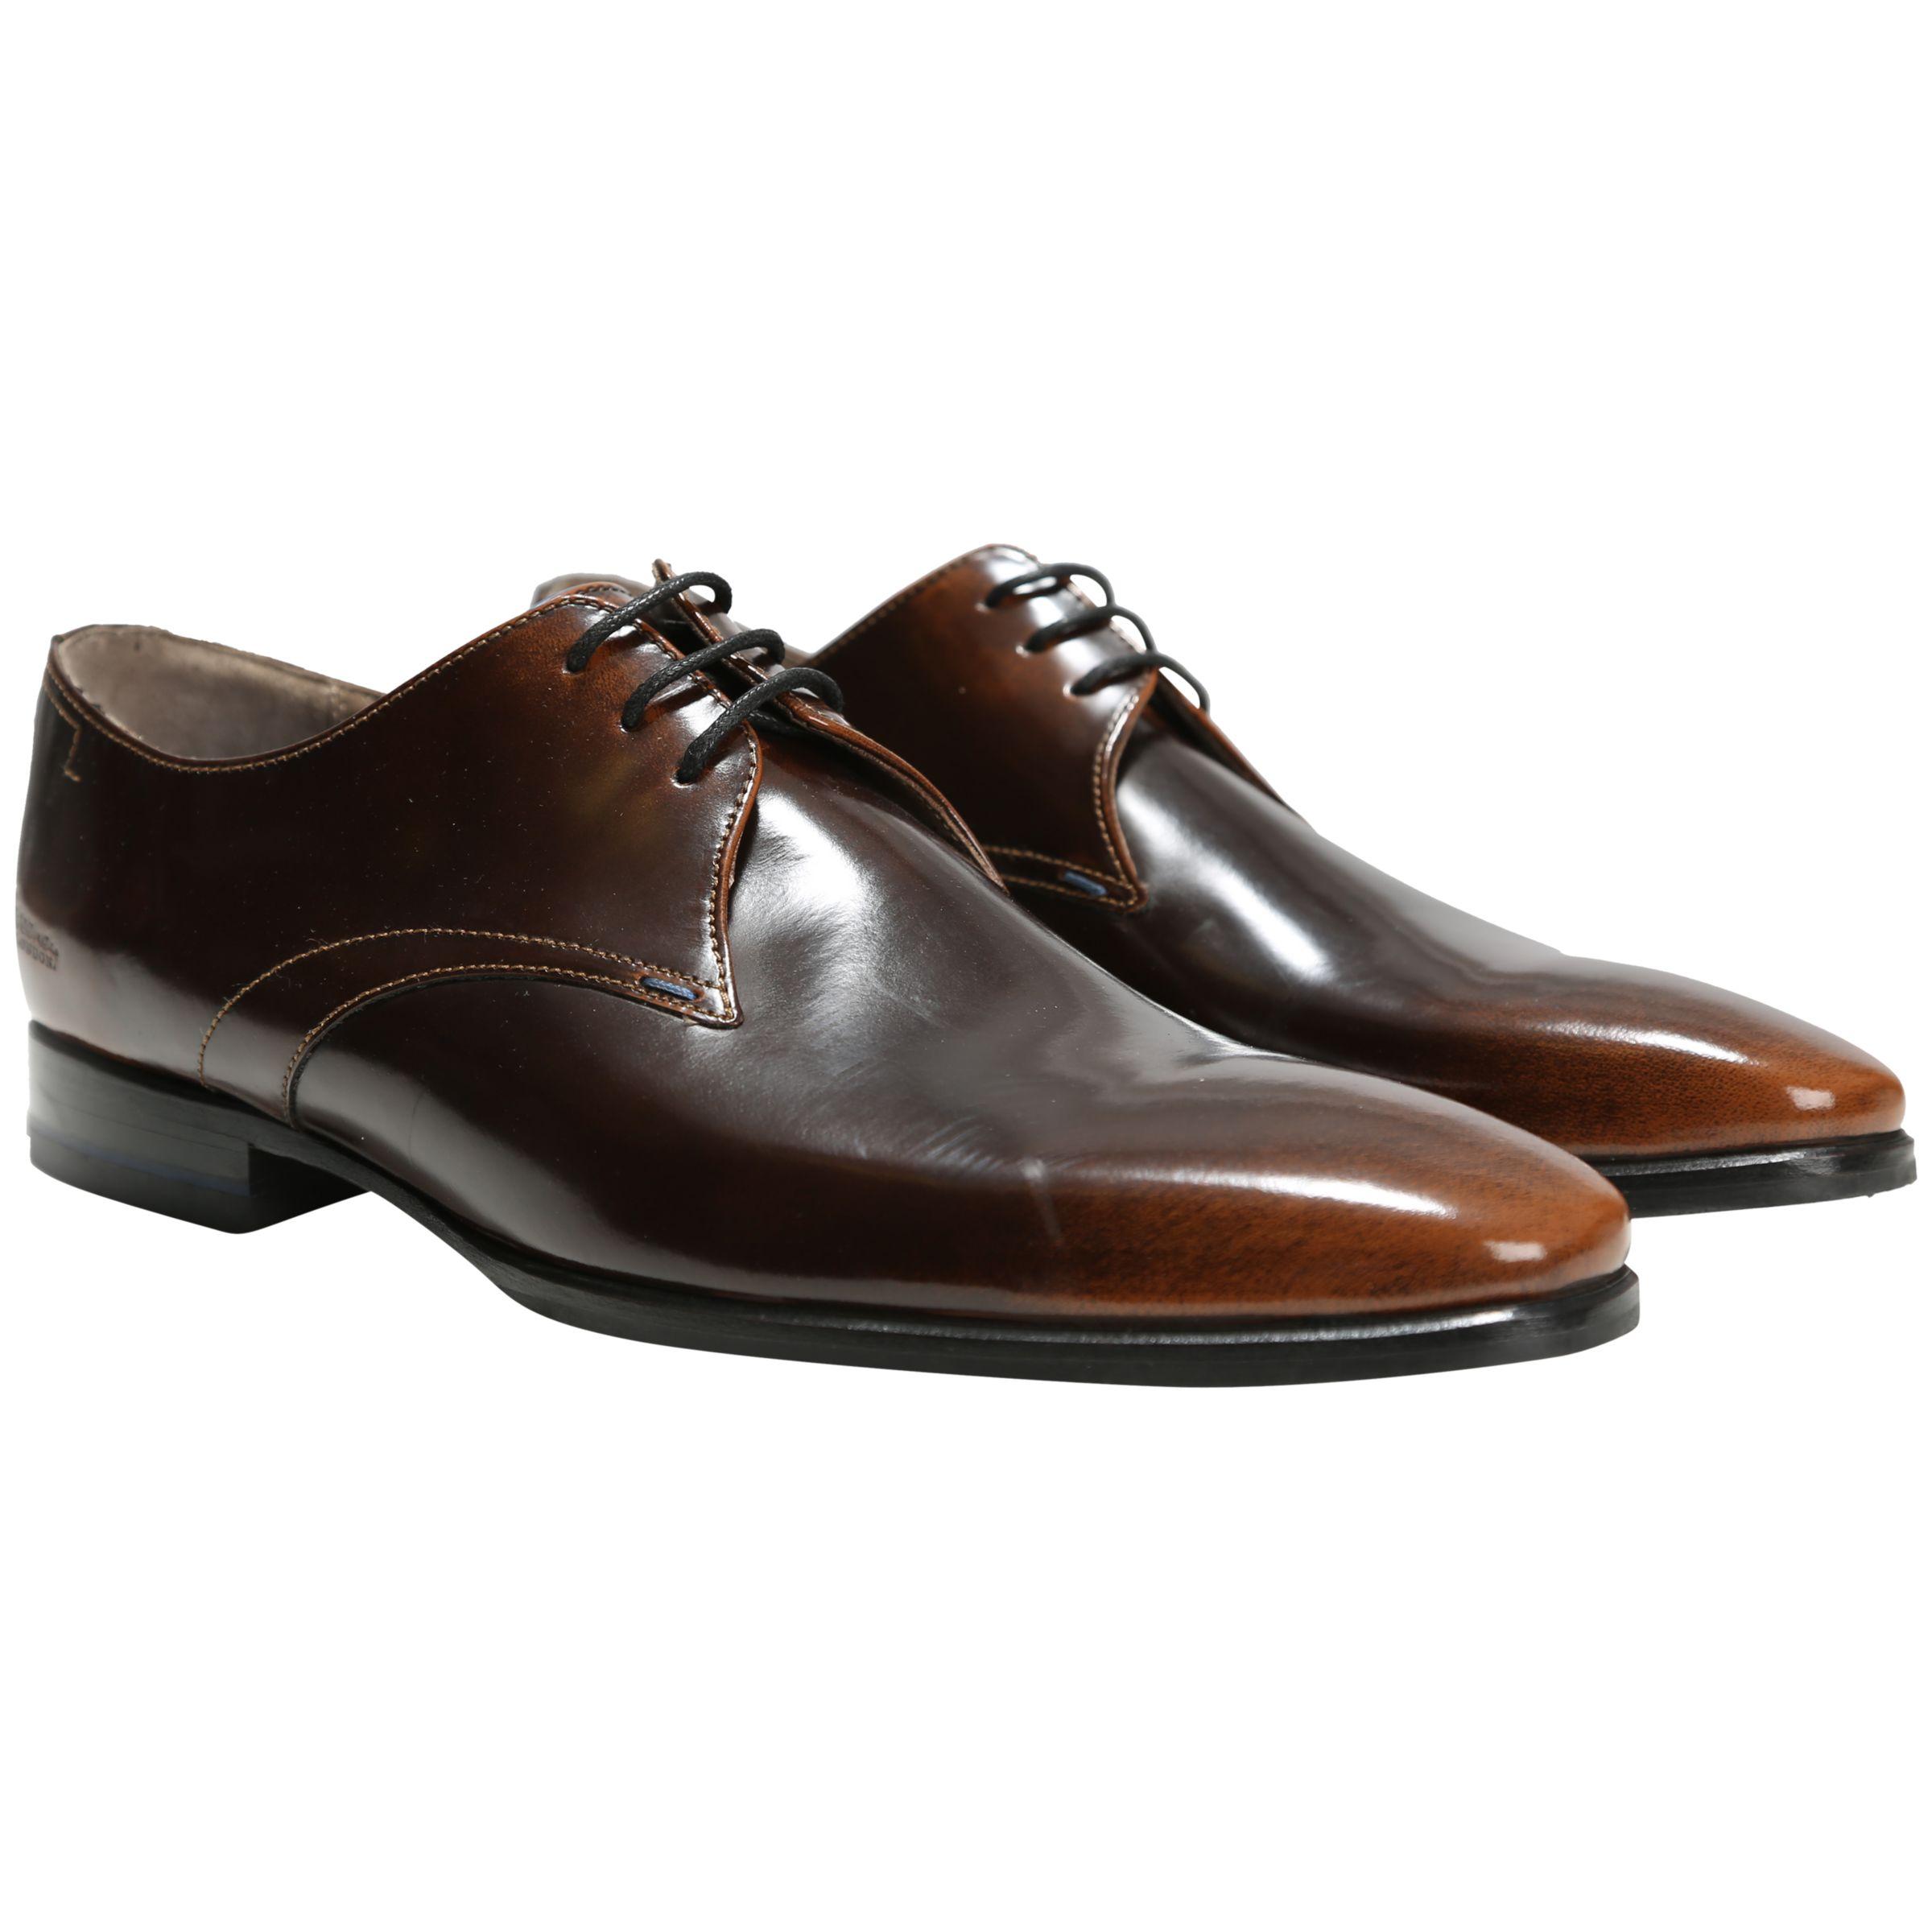 Oliver Sweeney Oliver Sweeney Tuckley Derby Shoes